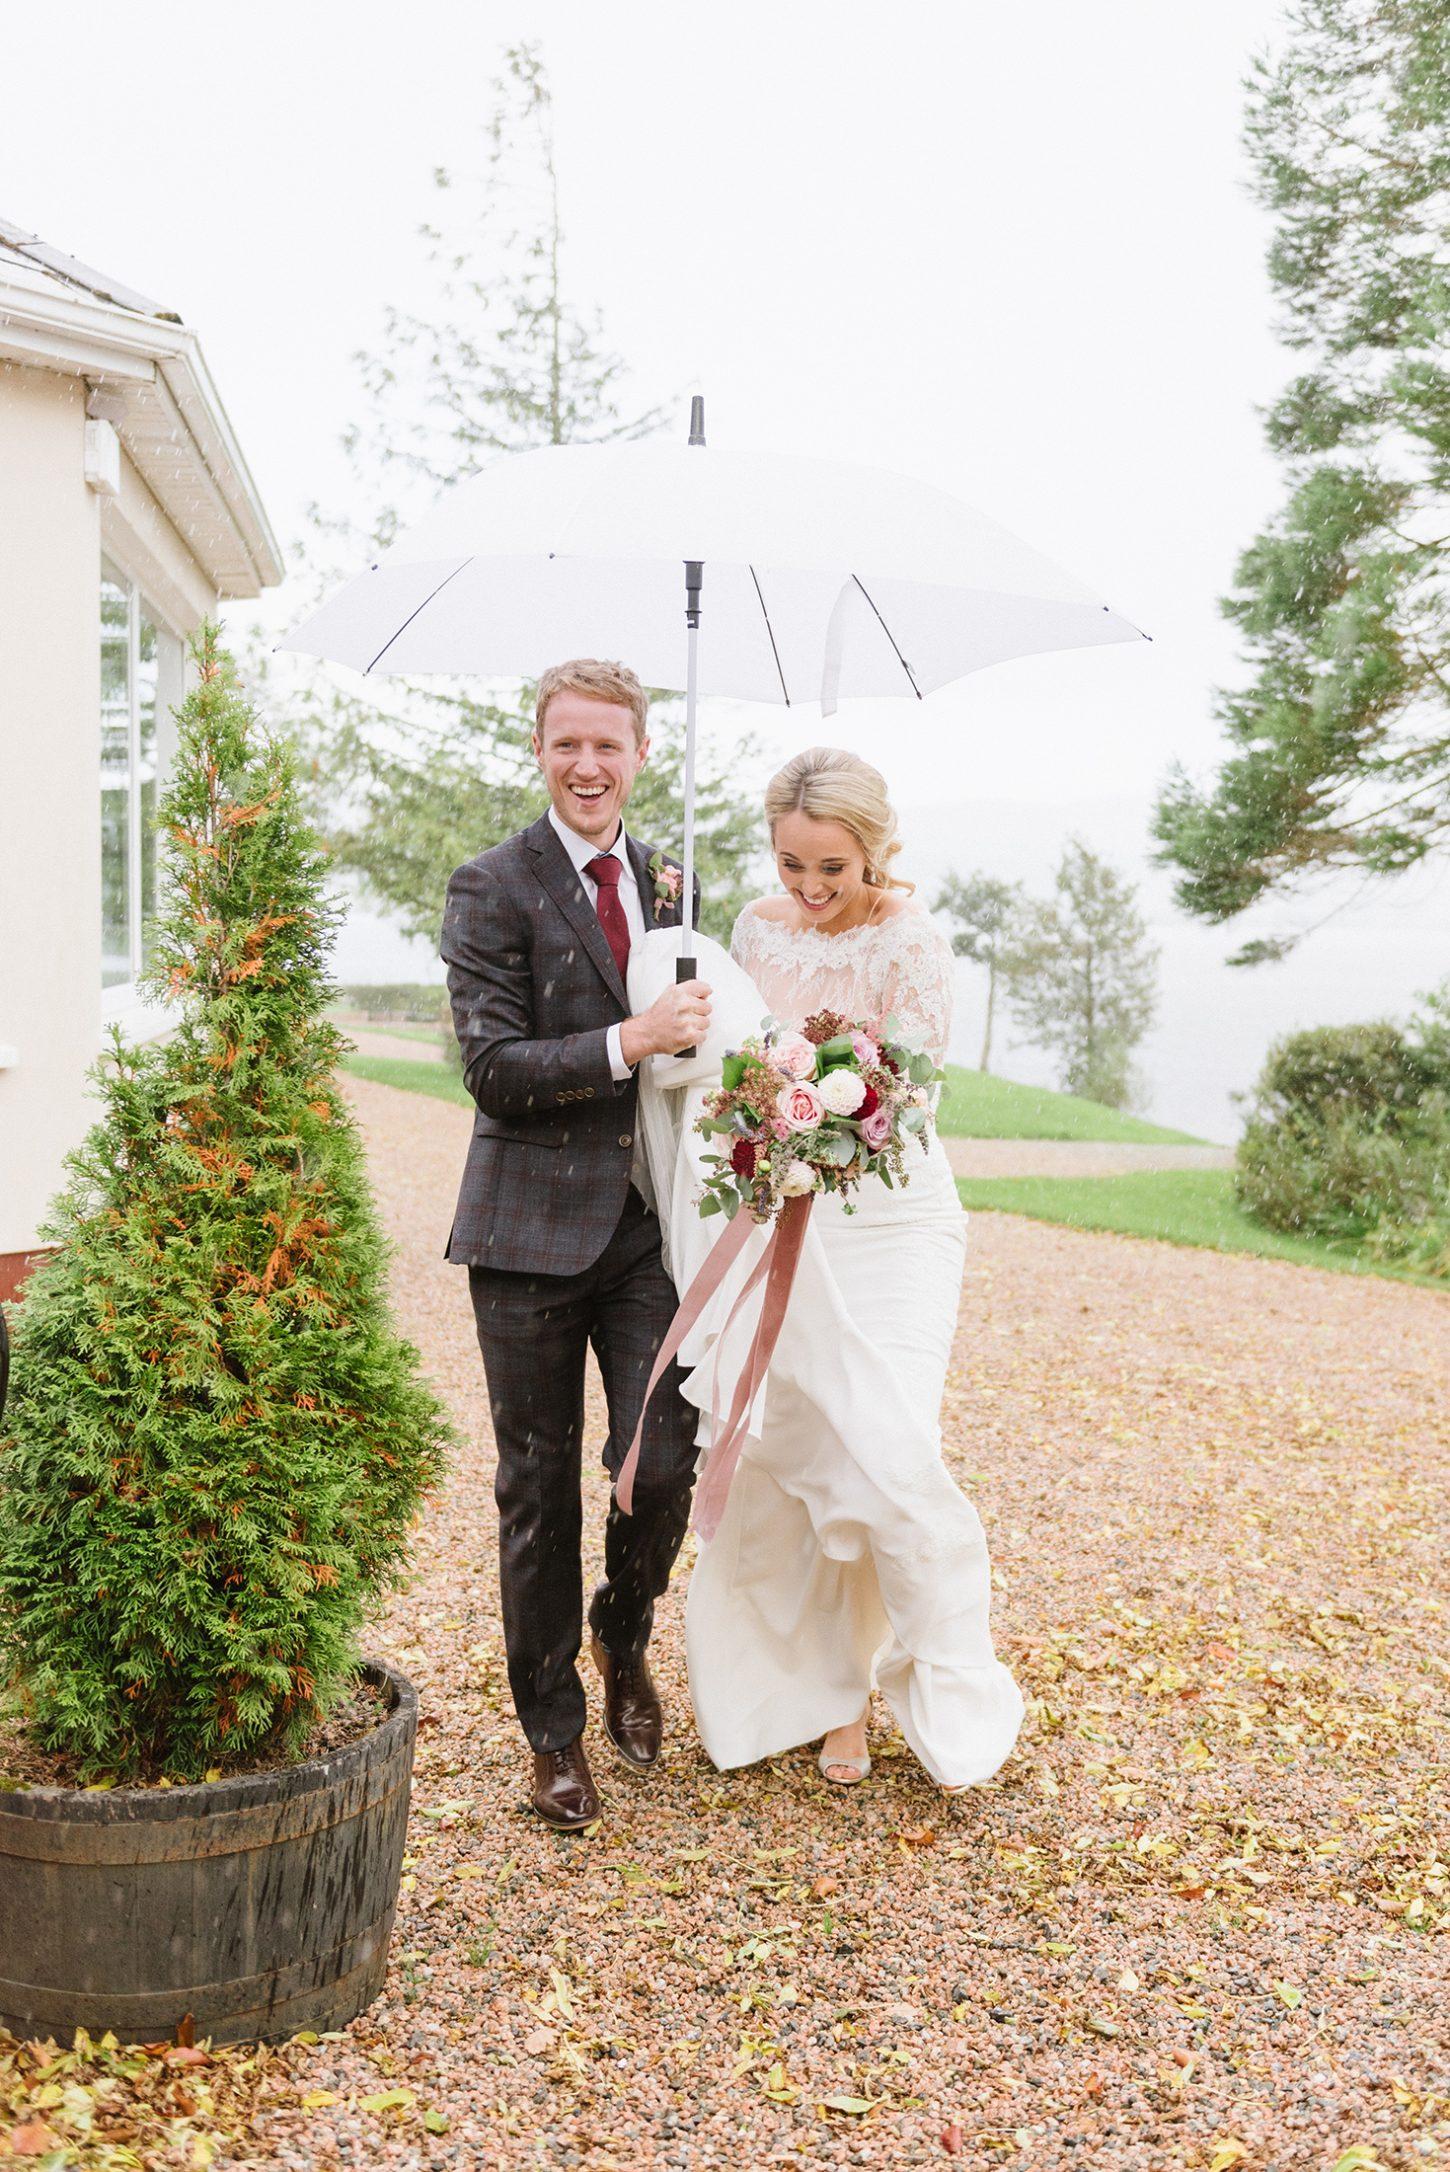 bride and groom with umbrellas on rainy wedding day